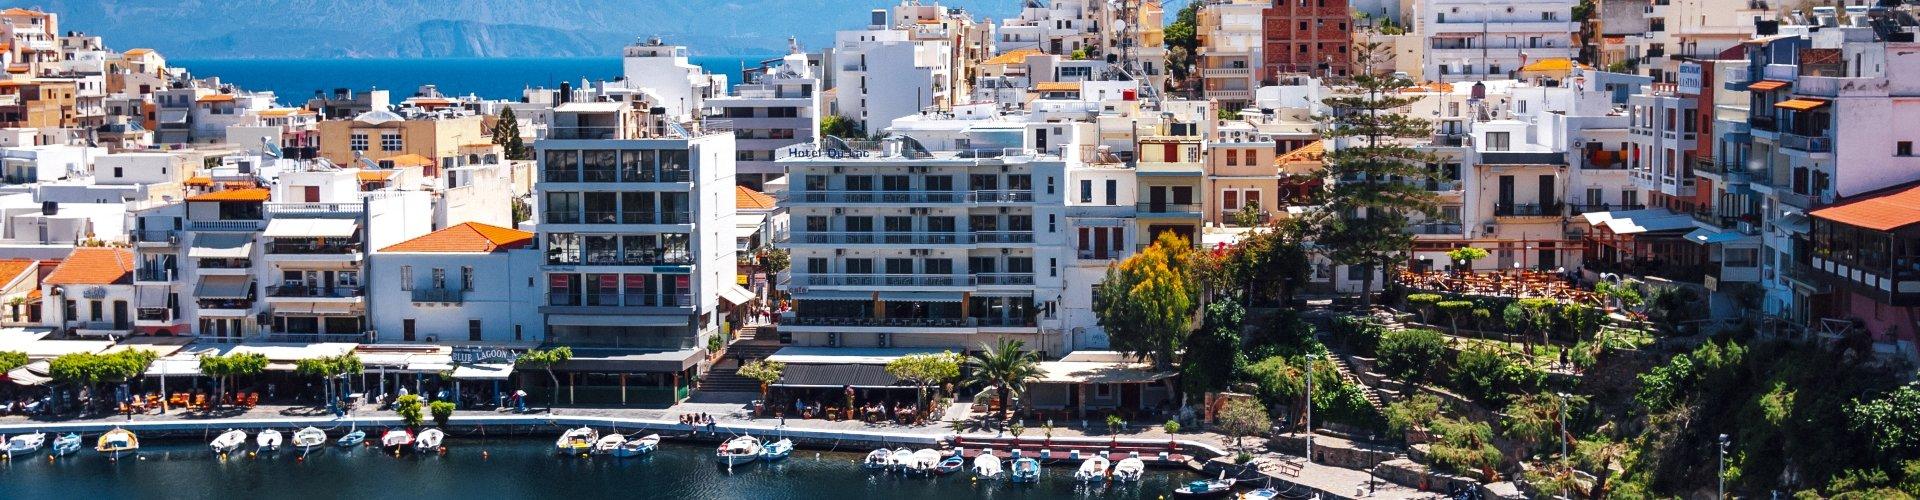 Ausflugsziel Agios Nikolaos